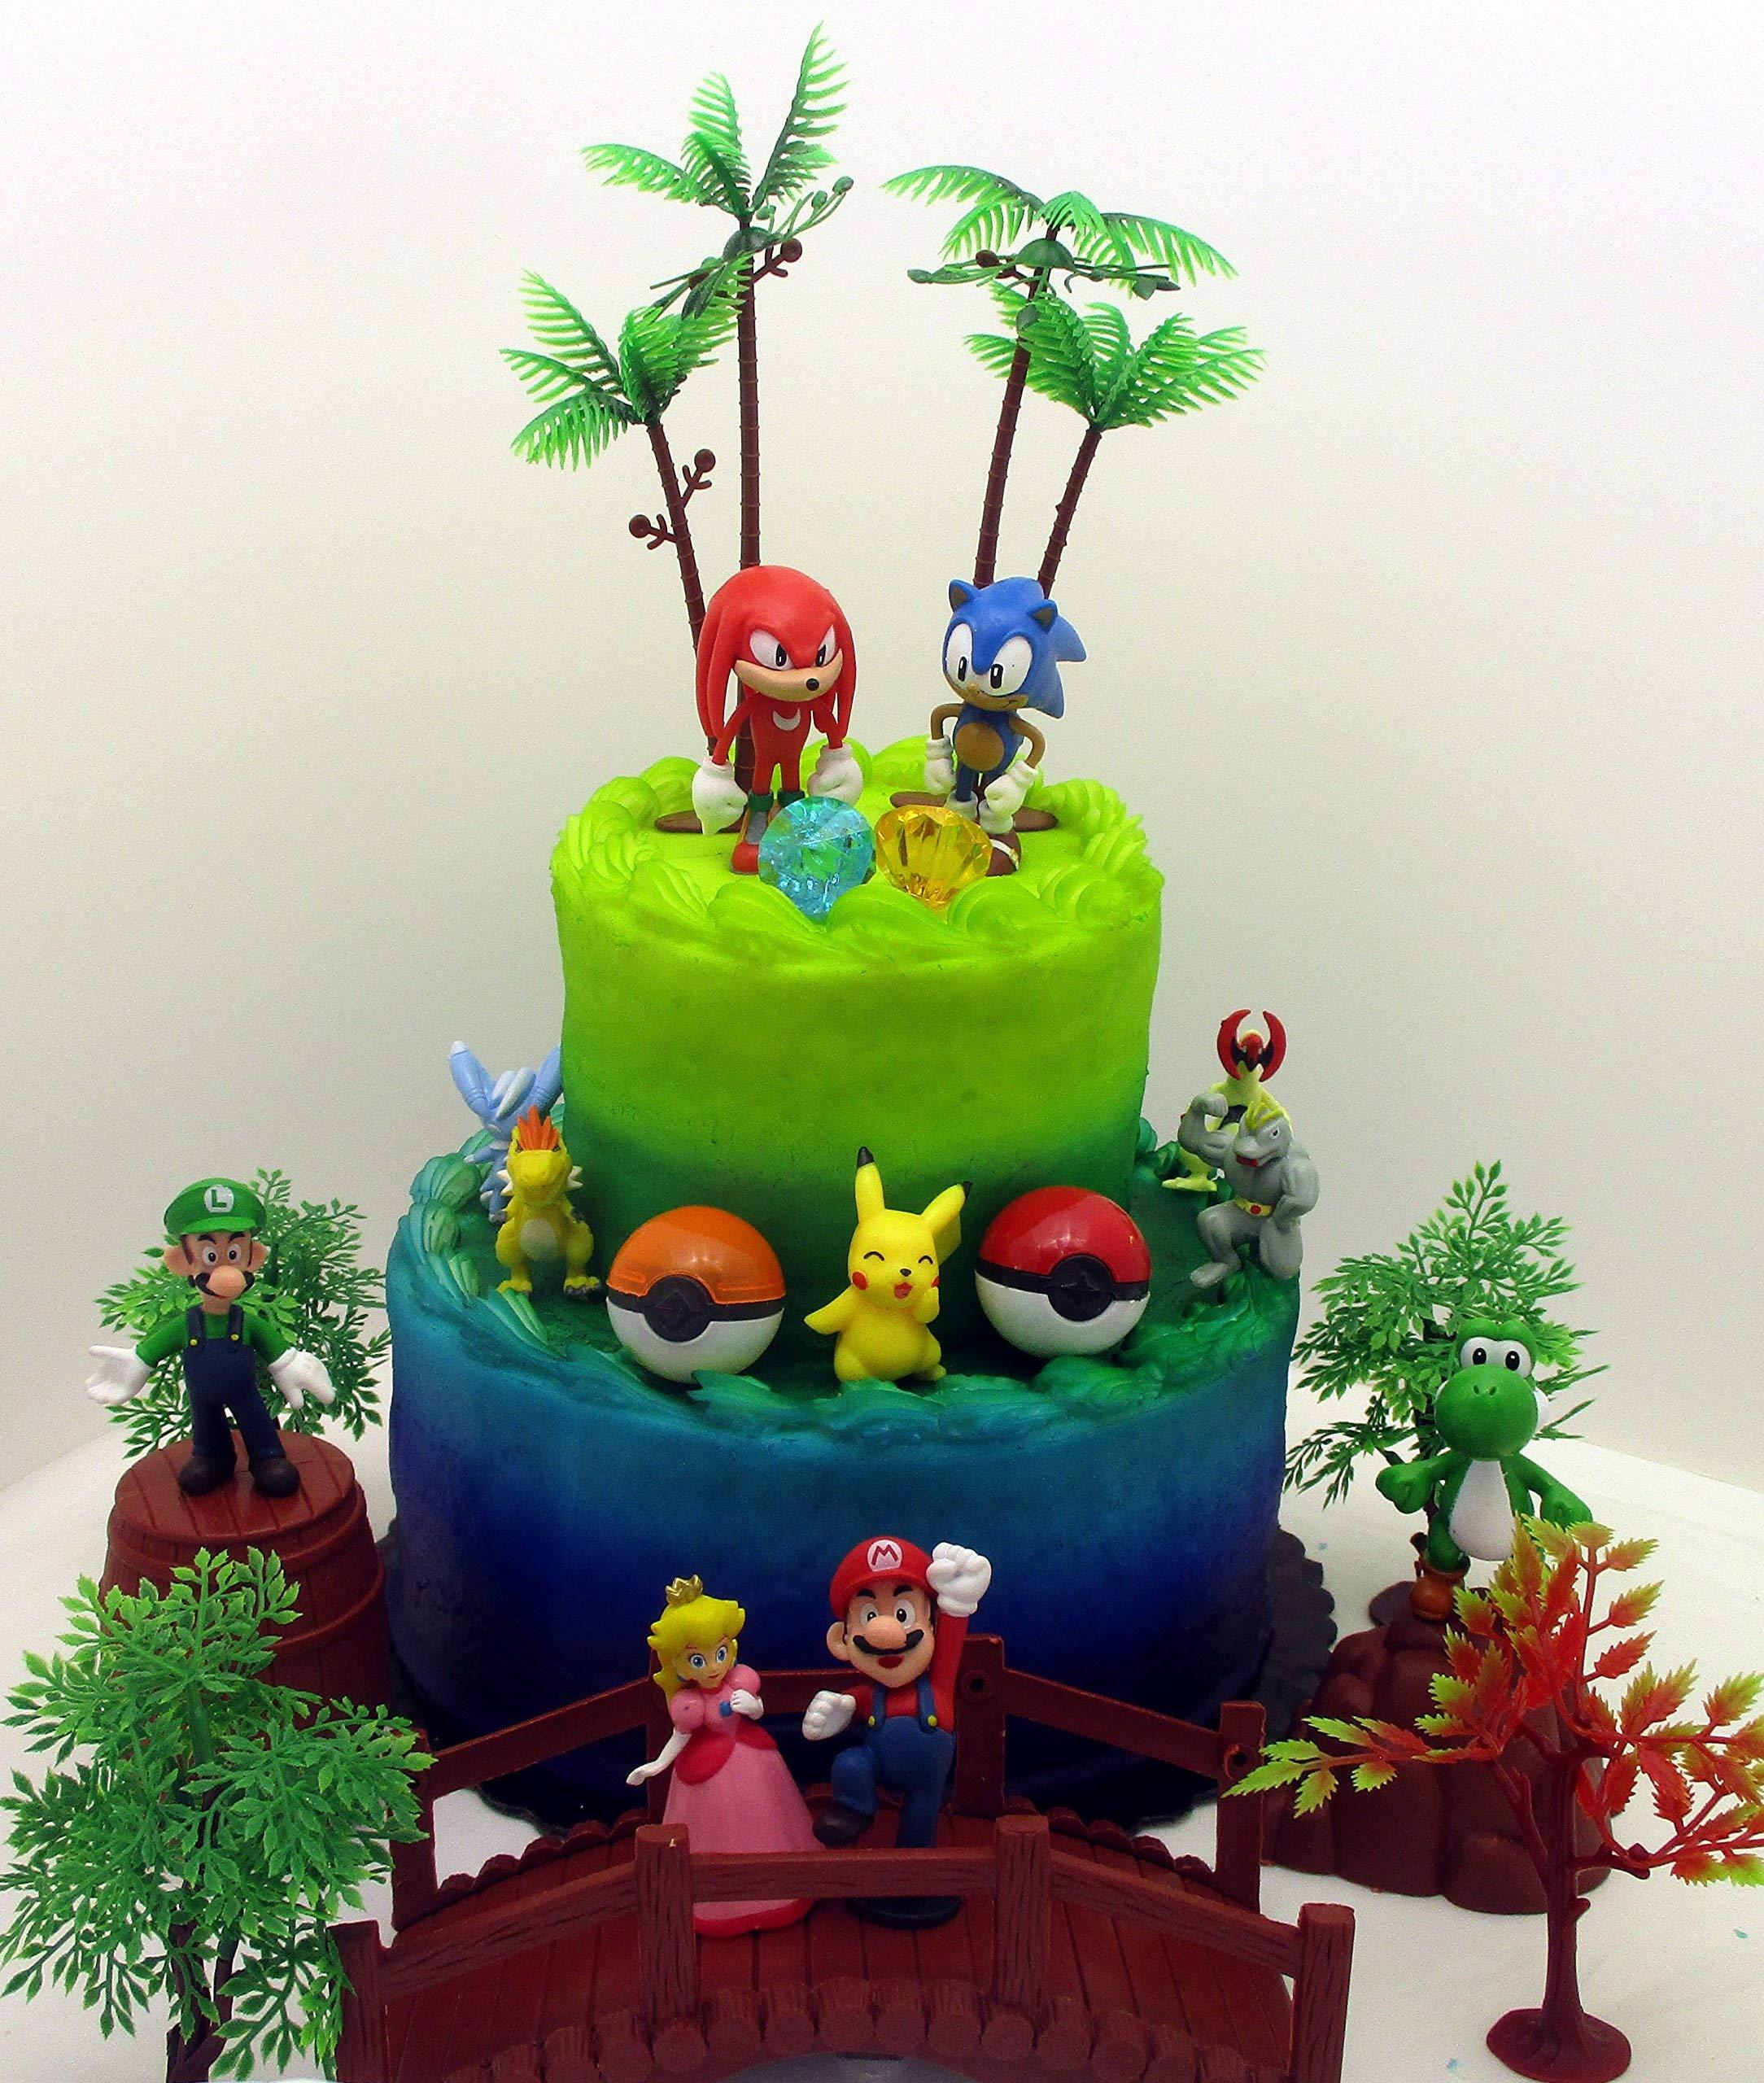 Video Gaming Themed Birthday Cake Topper Set Featuring Random SONIC Figures and Random MARIO BROTHERS Figures and Other Iconic Gaming Characters